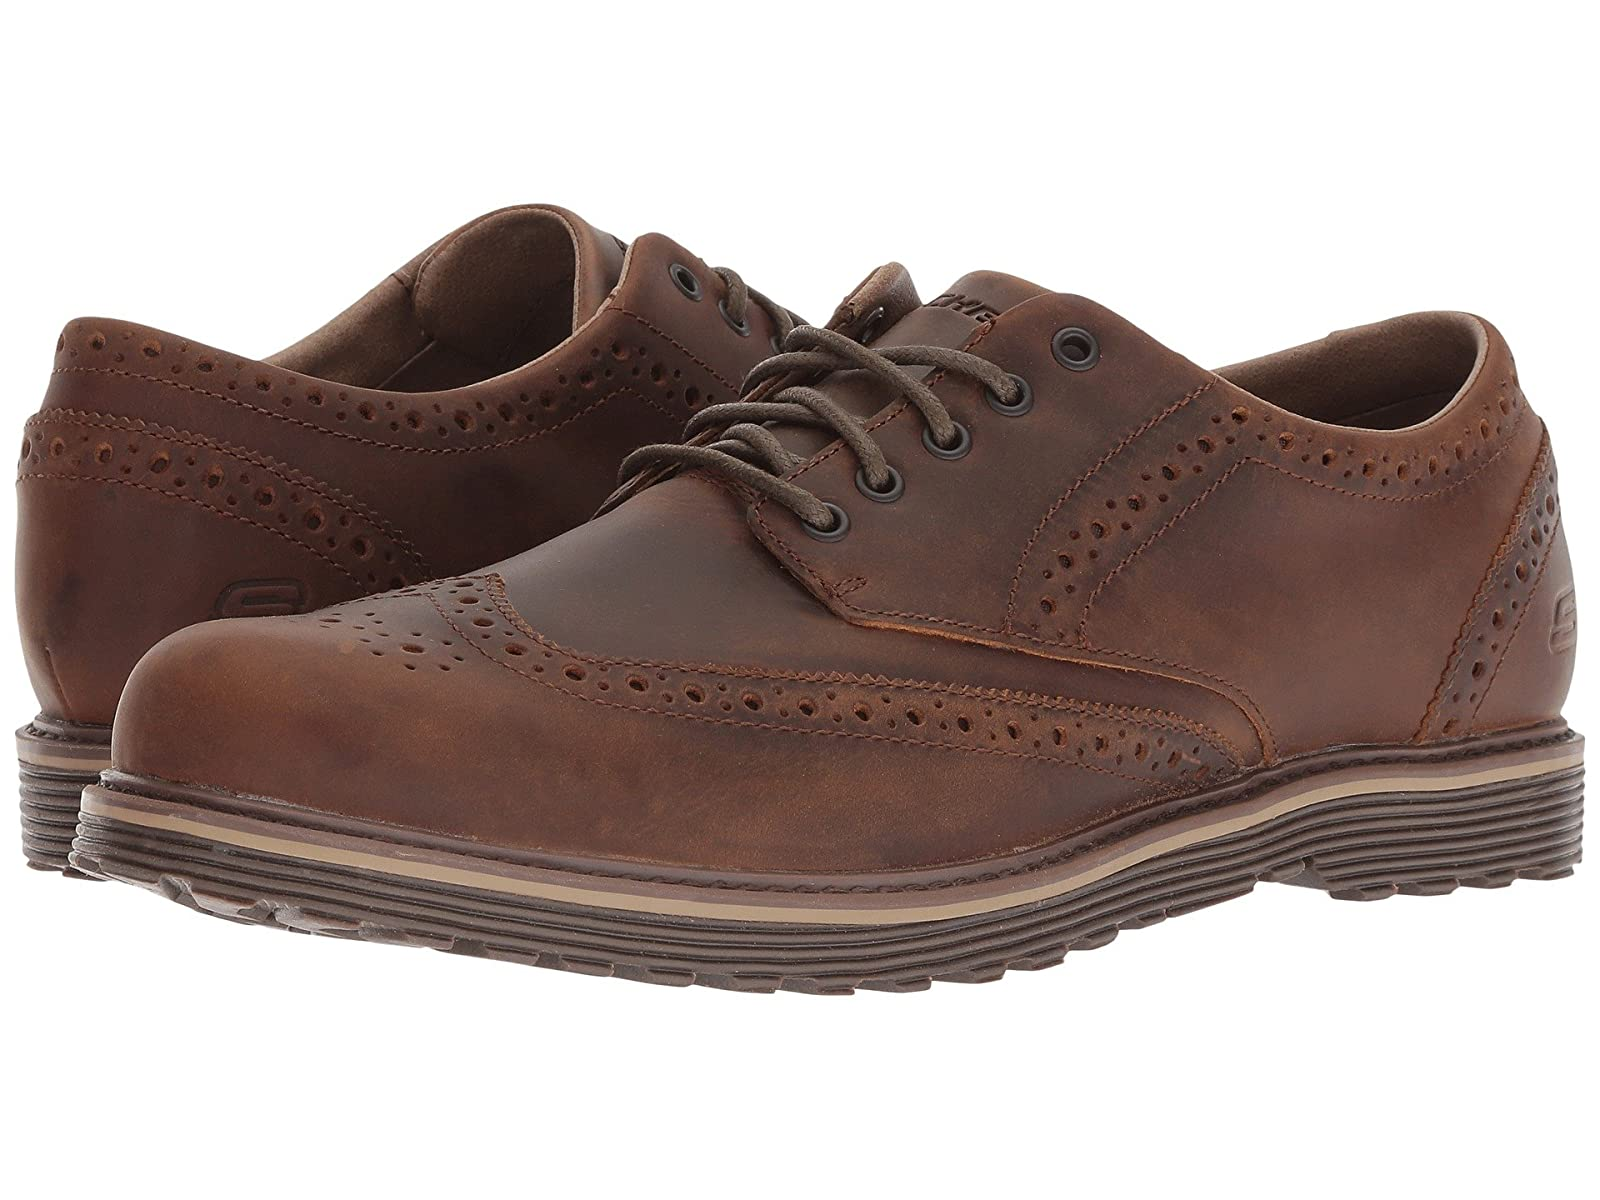 SKECHERS Solent - AlvenoCheap and distinctive eye-catching shoes